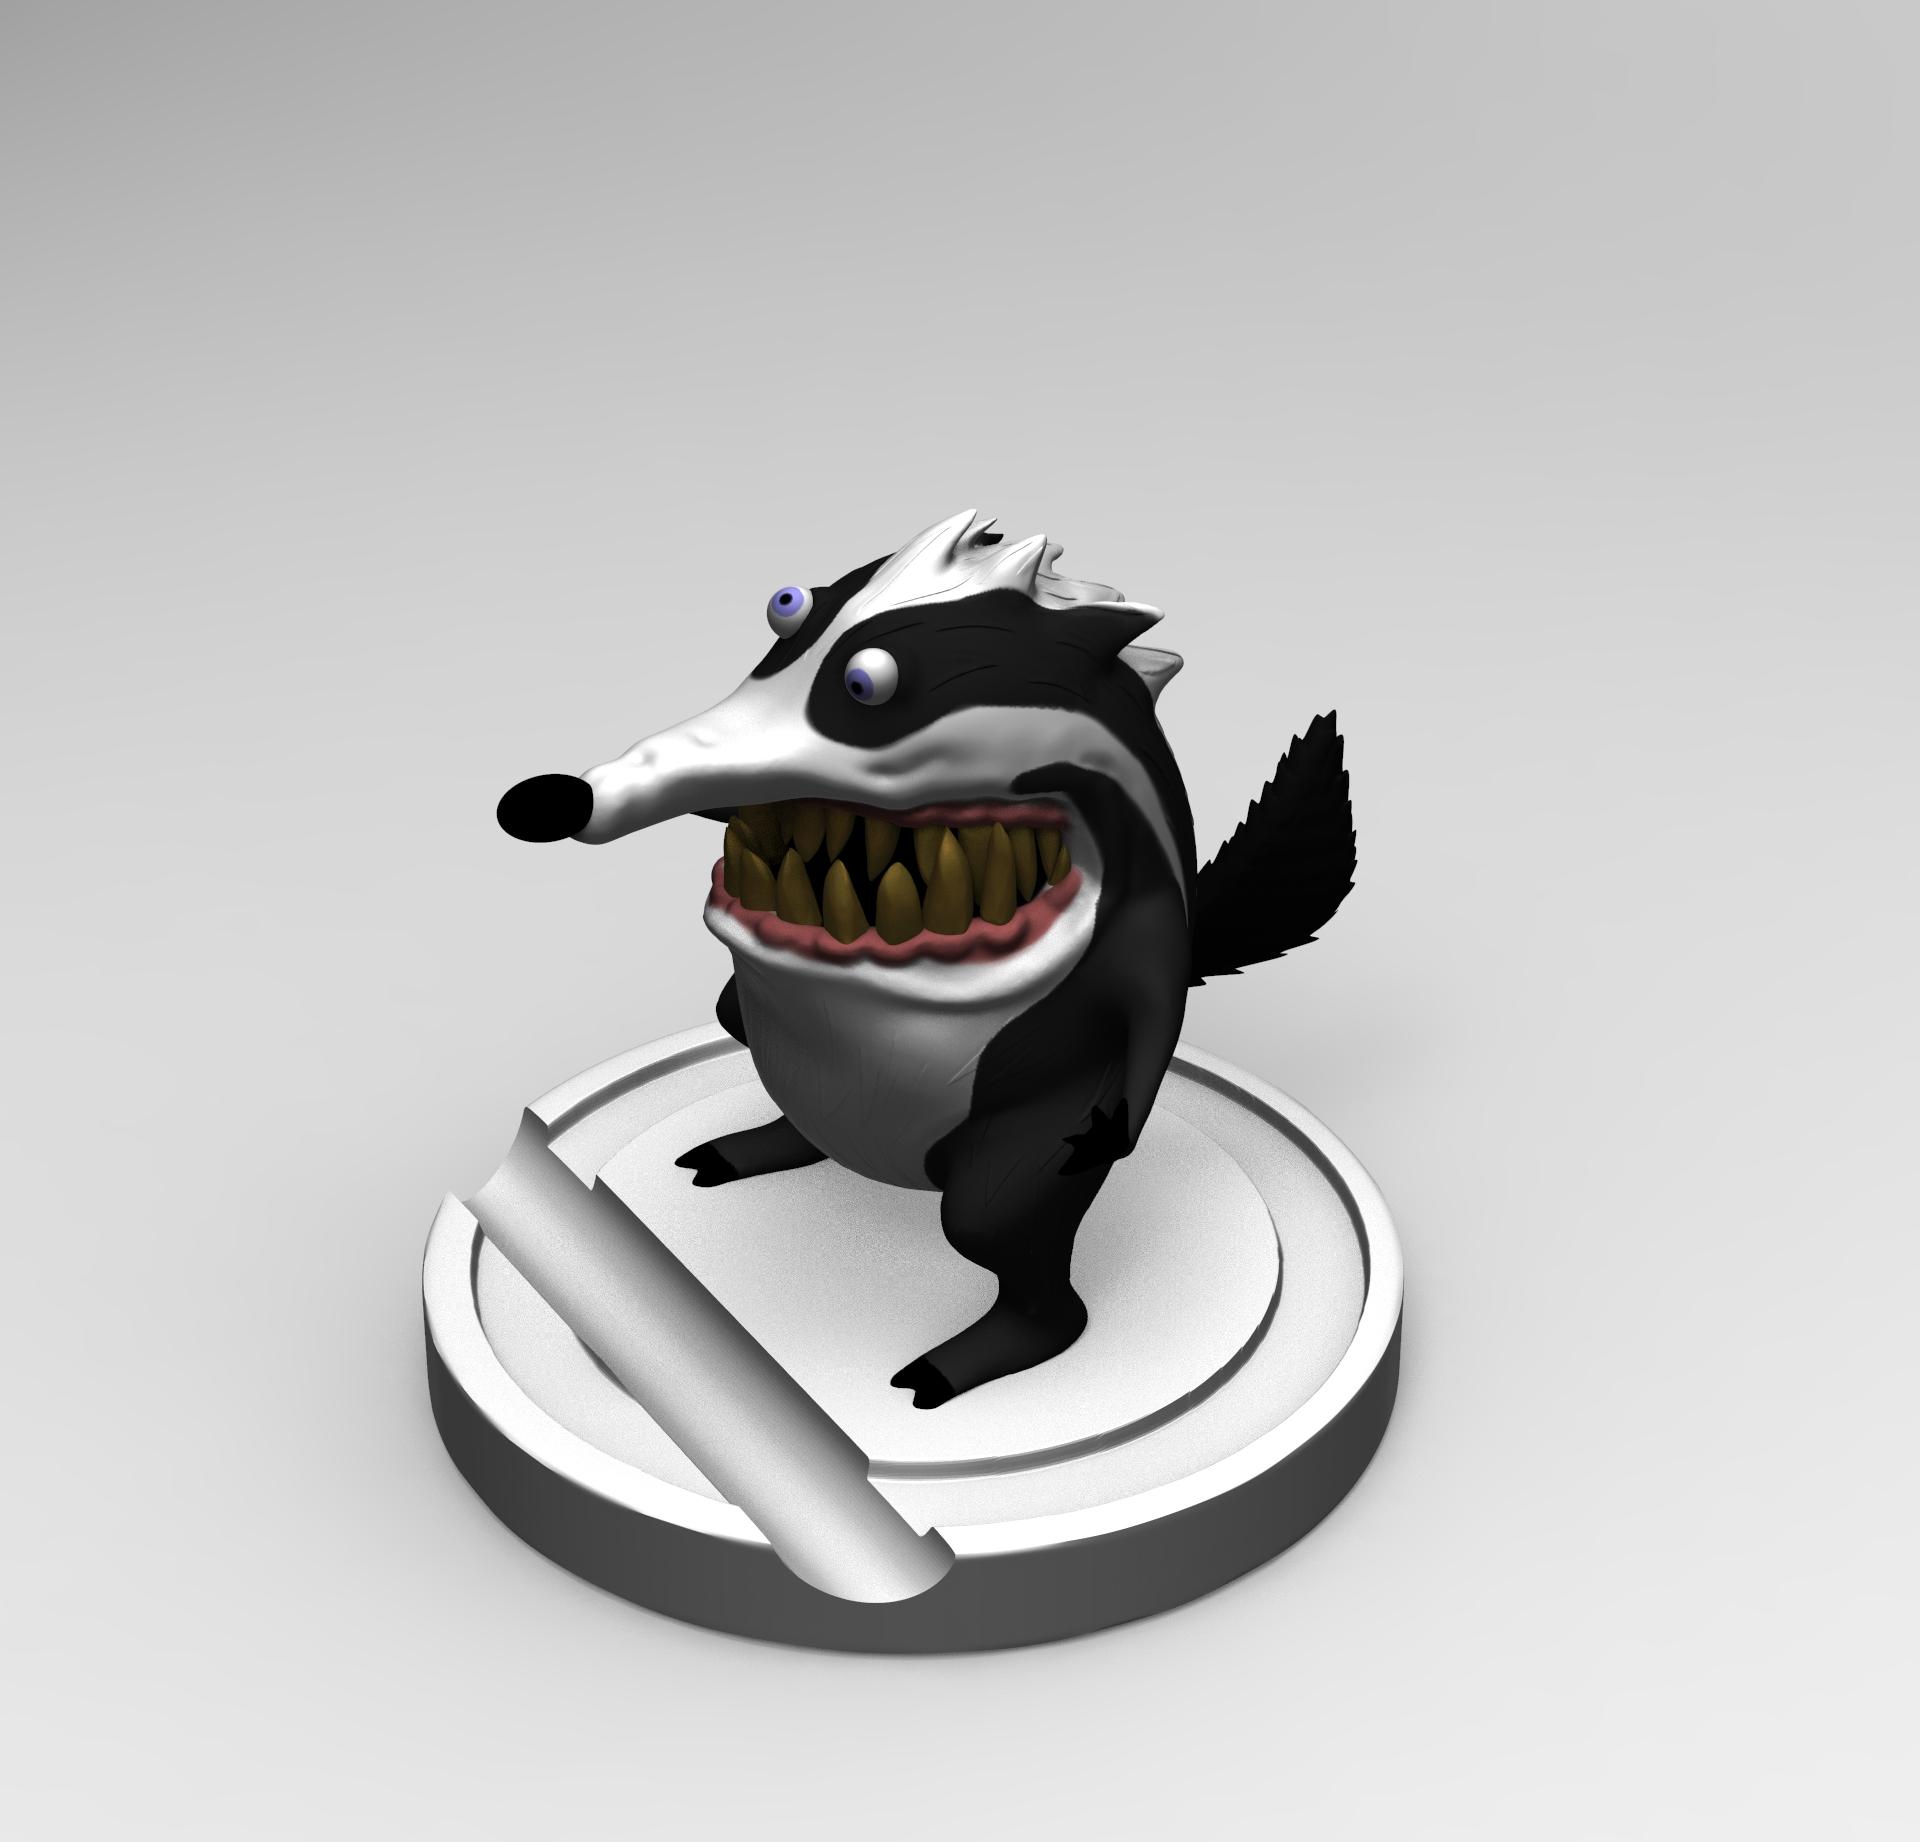 untitled.51.jpg Download free STL file Badger Woodpeaker • Template to 3D print, mefedef